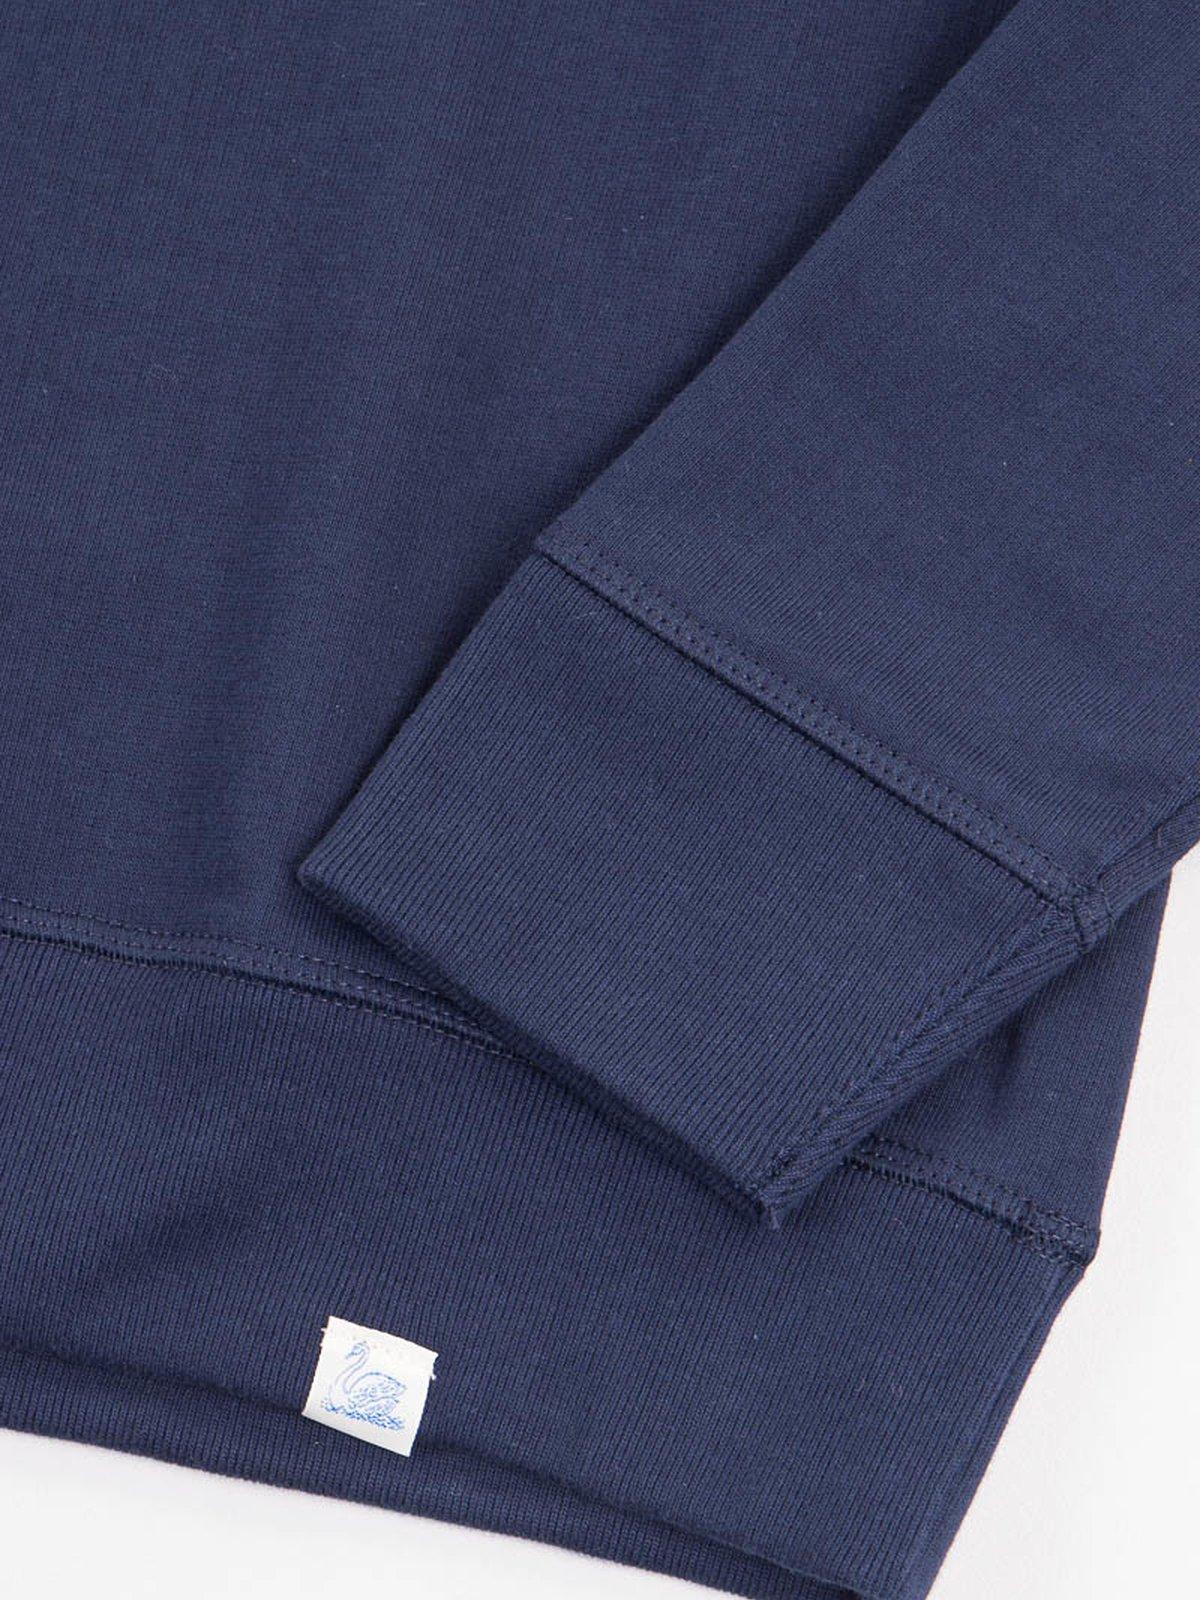 Ink Blue 346OS Organic Cotton Oversized Sweater - Image 3